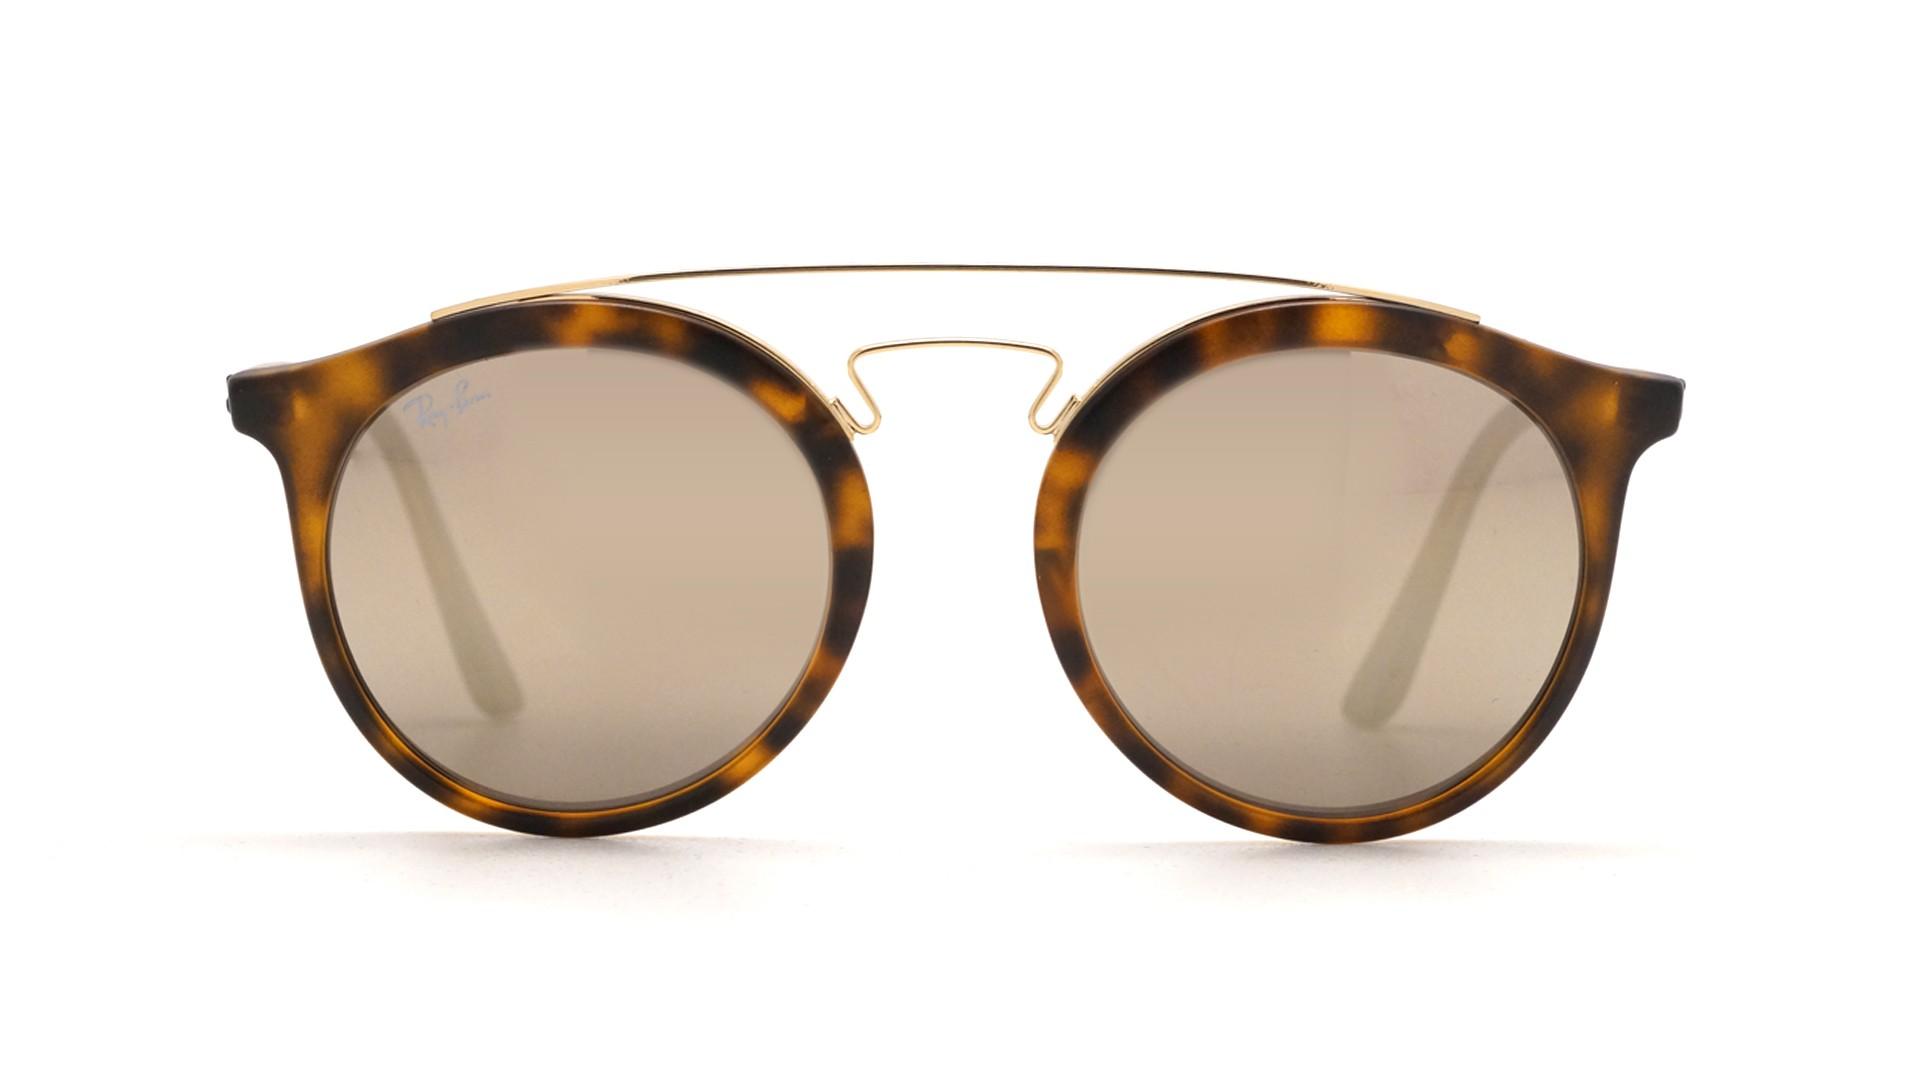 Ray Ban Gatsby Style 5 Kaufen « Heritage Malta 85bbb3039619